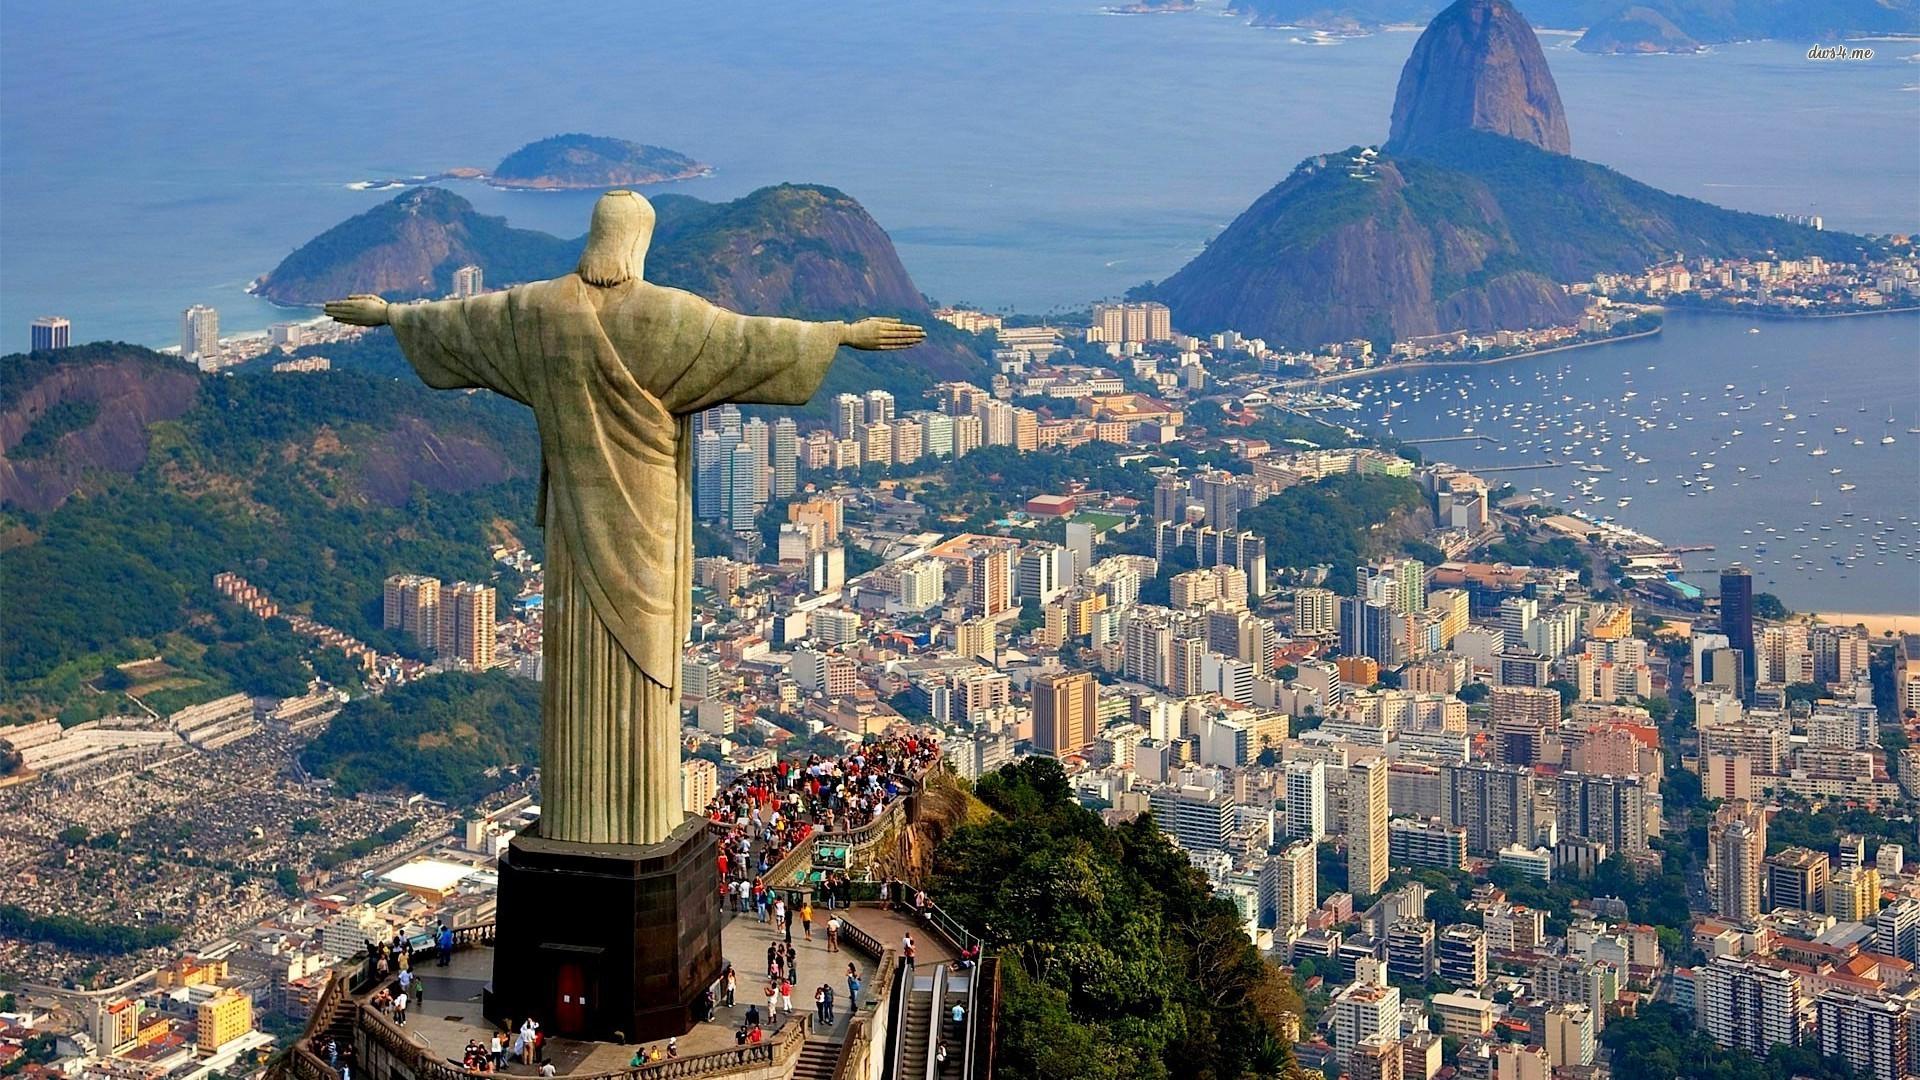 Rio de Janeiro City Wallpapers Live HD Wallpaper HQ Pictures Images 1920x1080